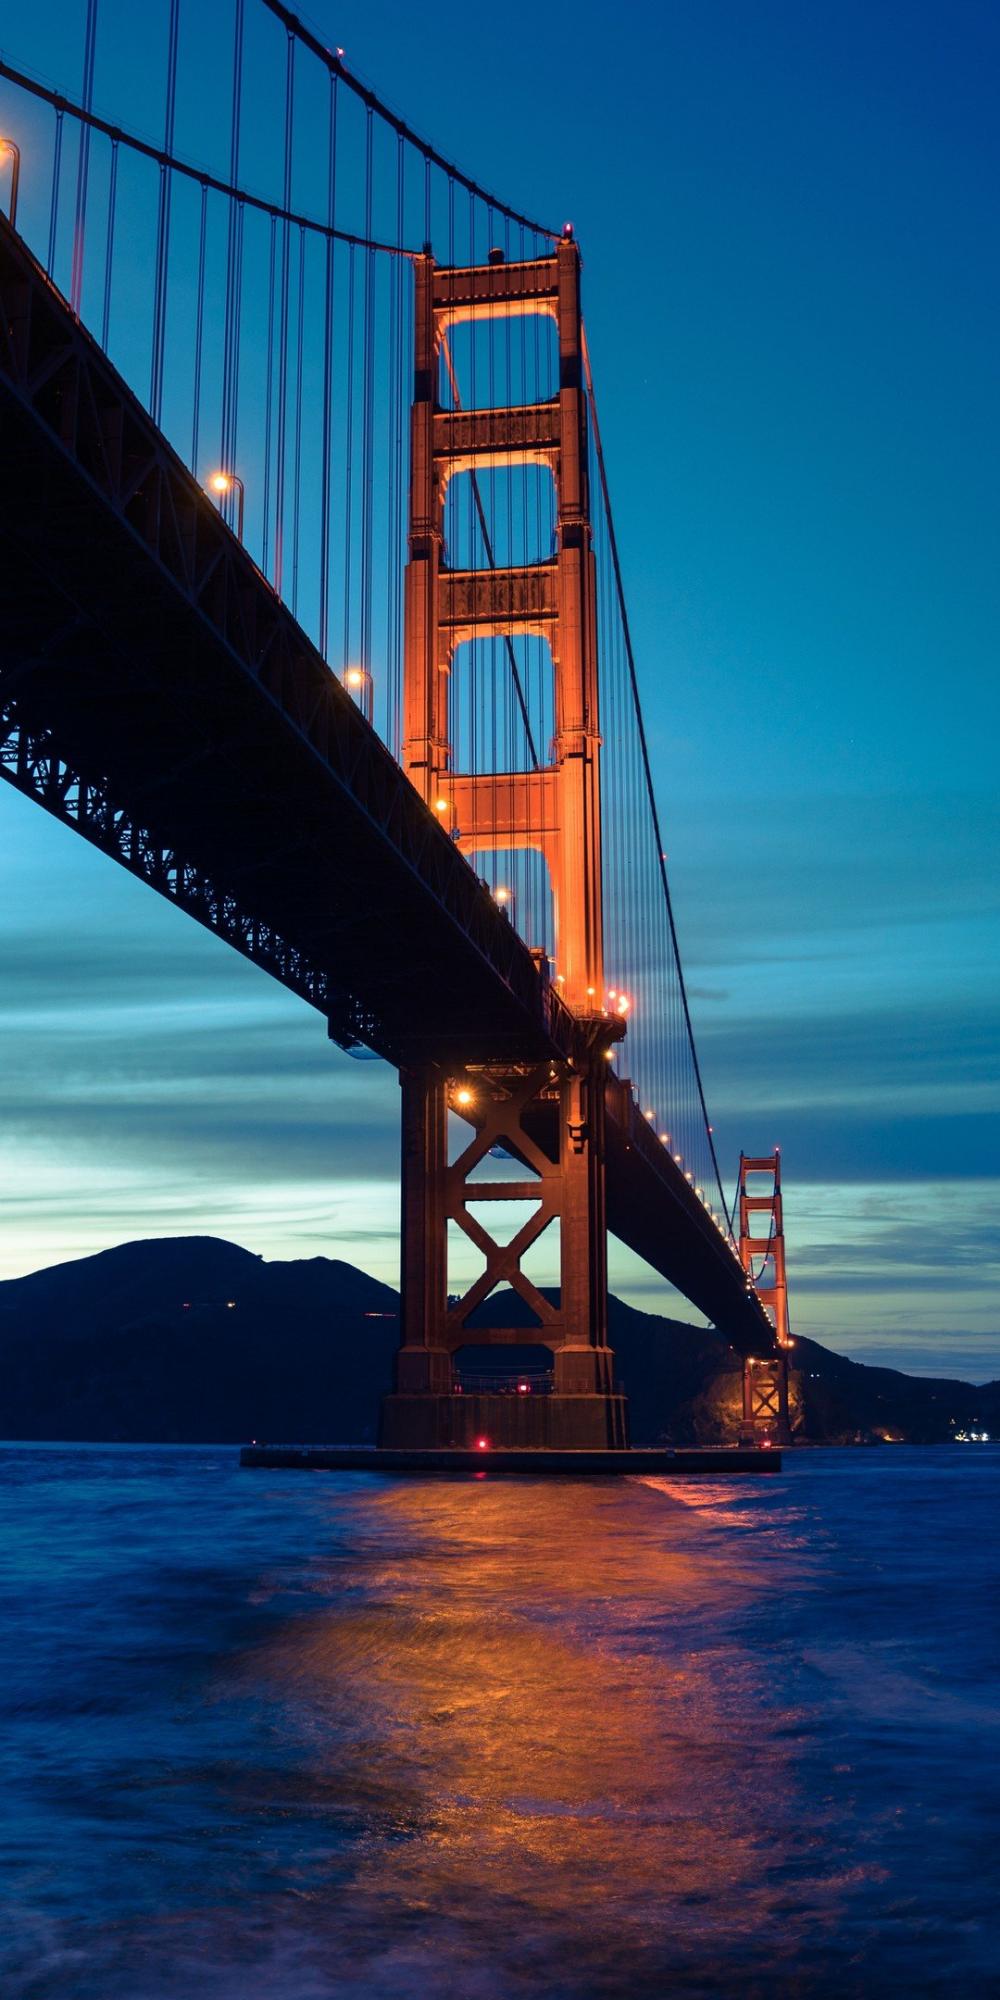 Ultra Hd Iphone Wallpapers Bridge Sea Landscape 6wallpaper Wallpaprs Background Iphone Iphone11 Iphonewallpapers Phon Landscape Visit San Francisco San